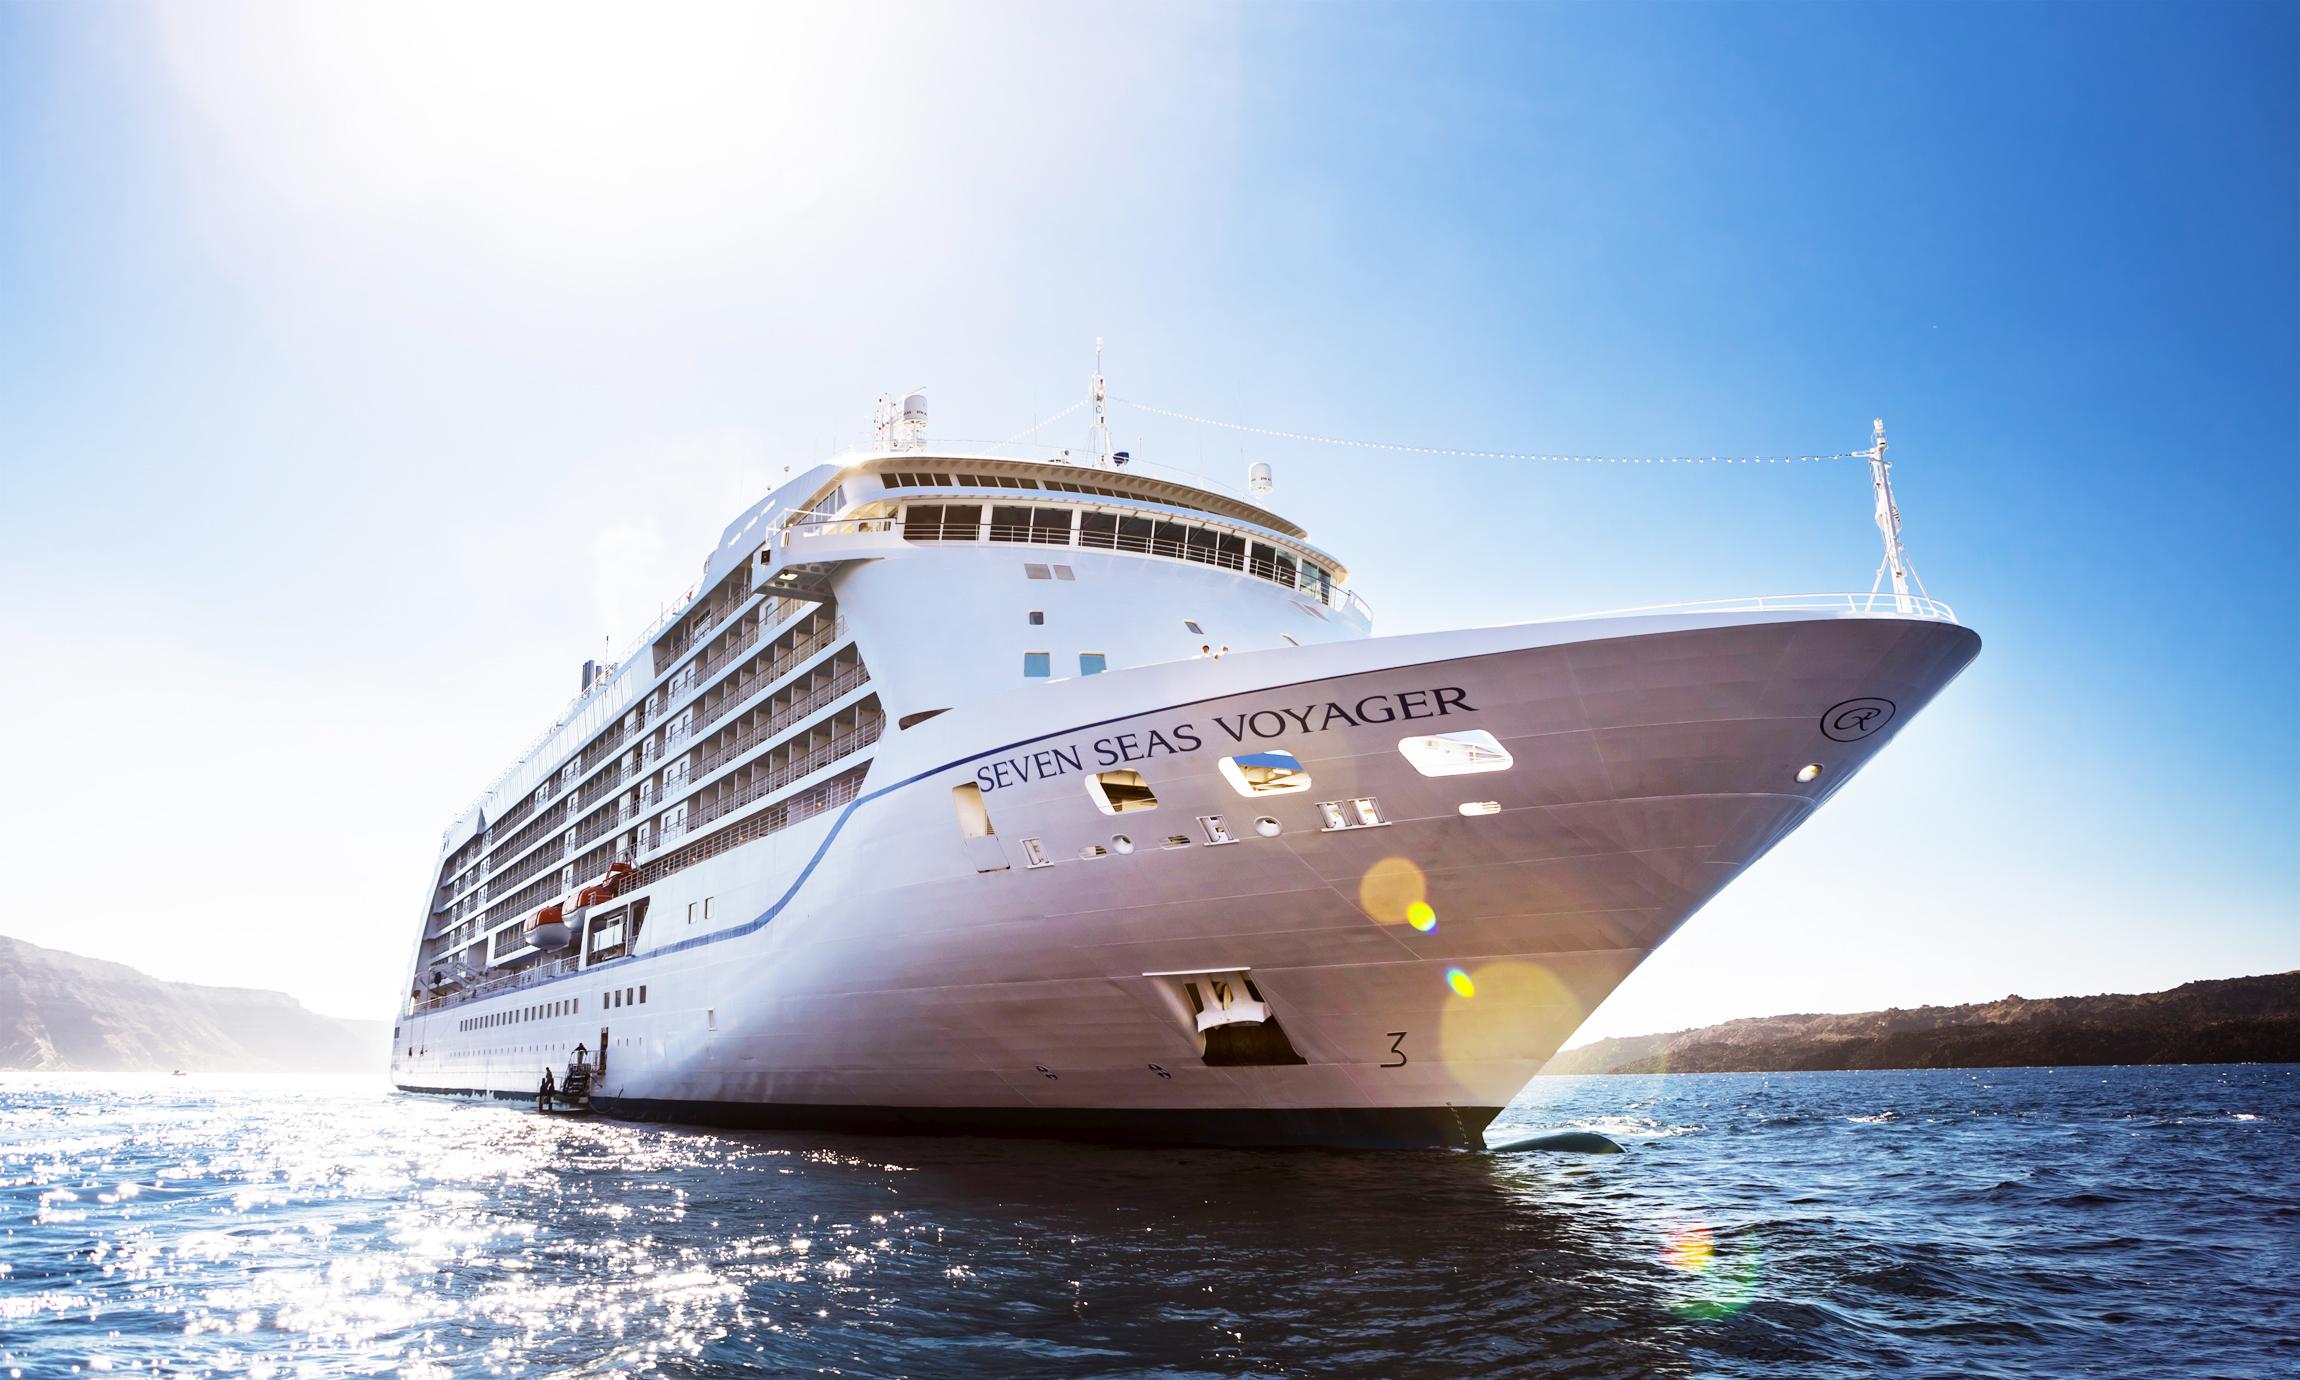 Cruzeiro Seven Seas Voyager